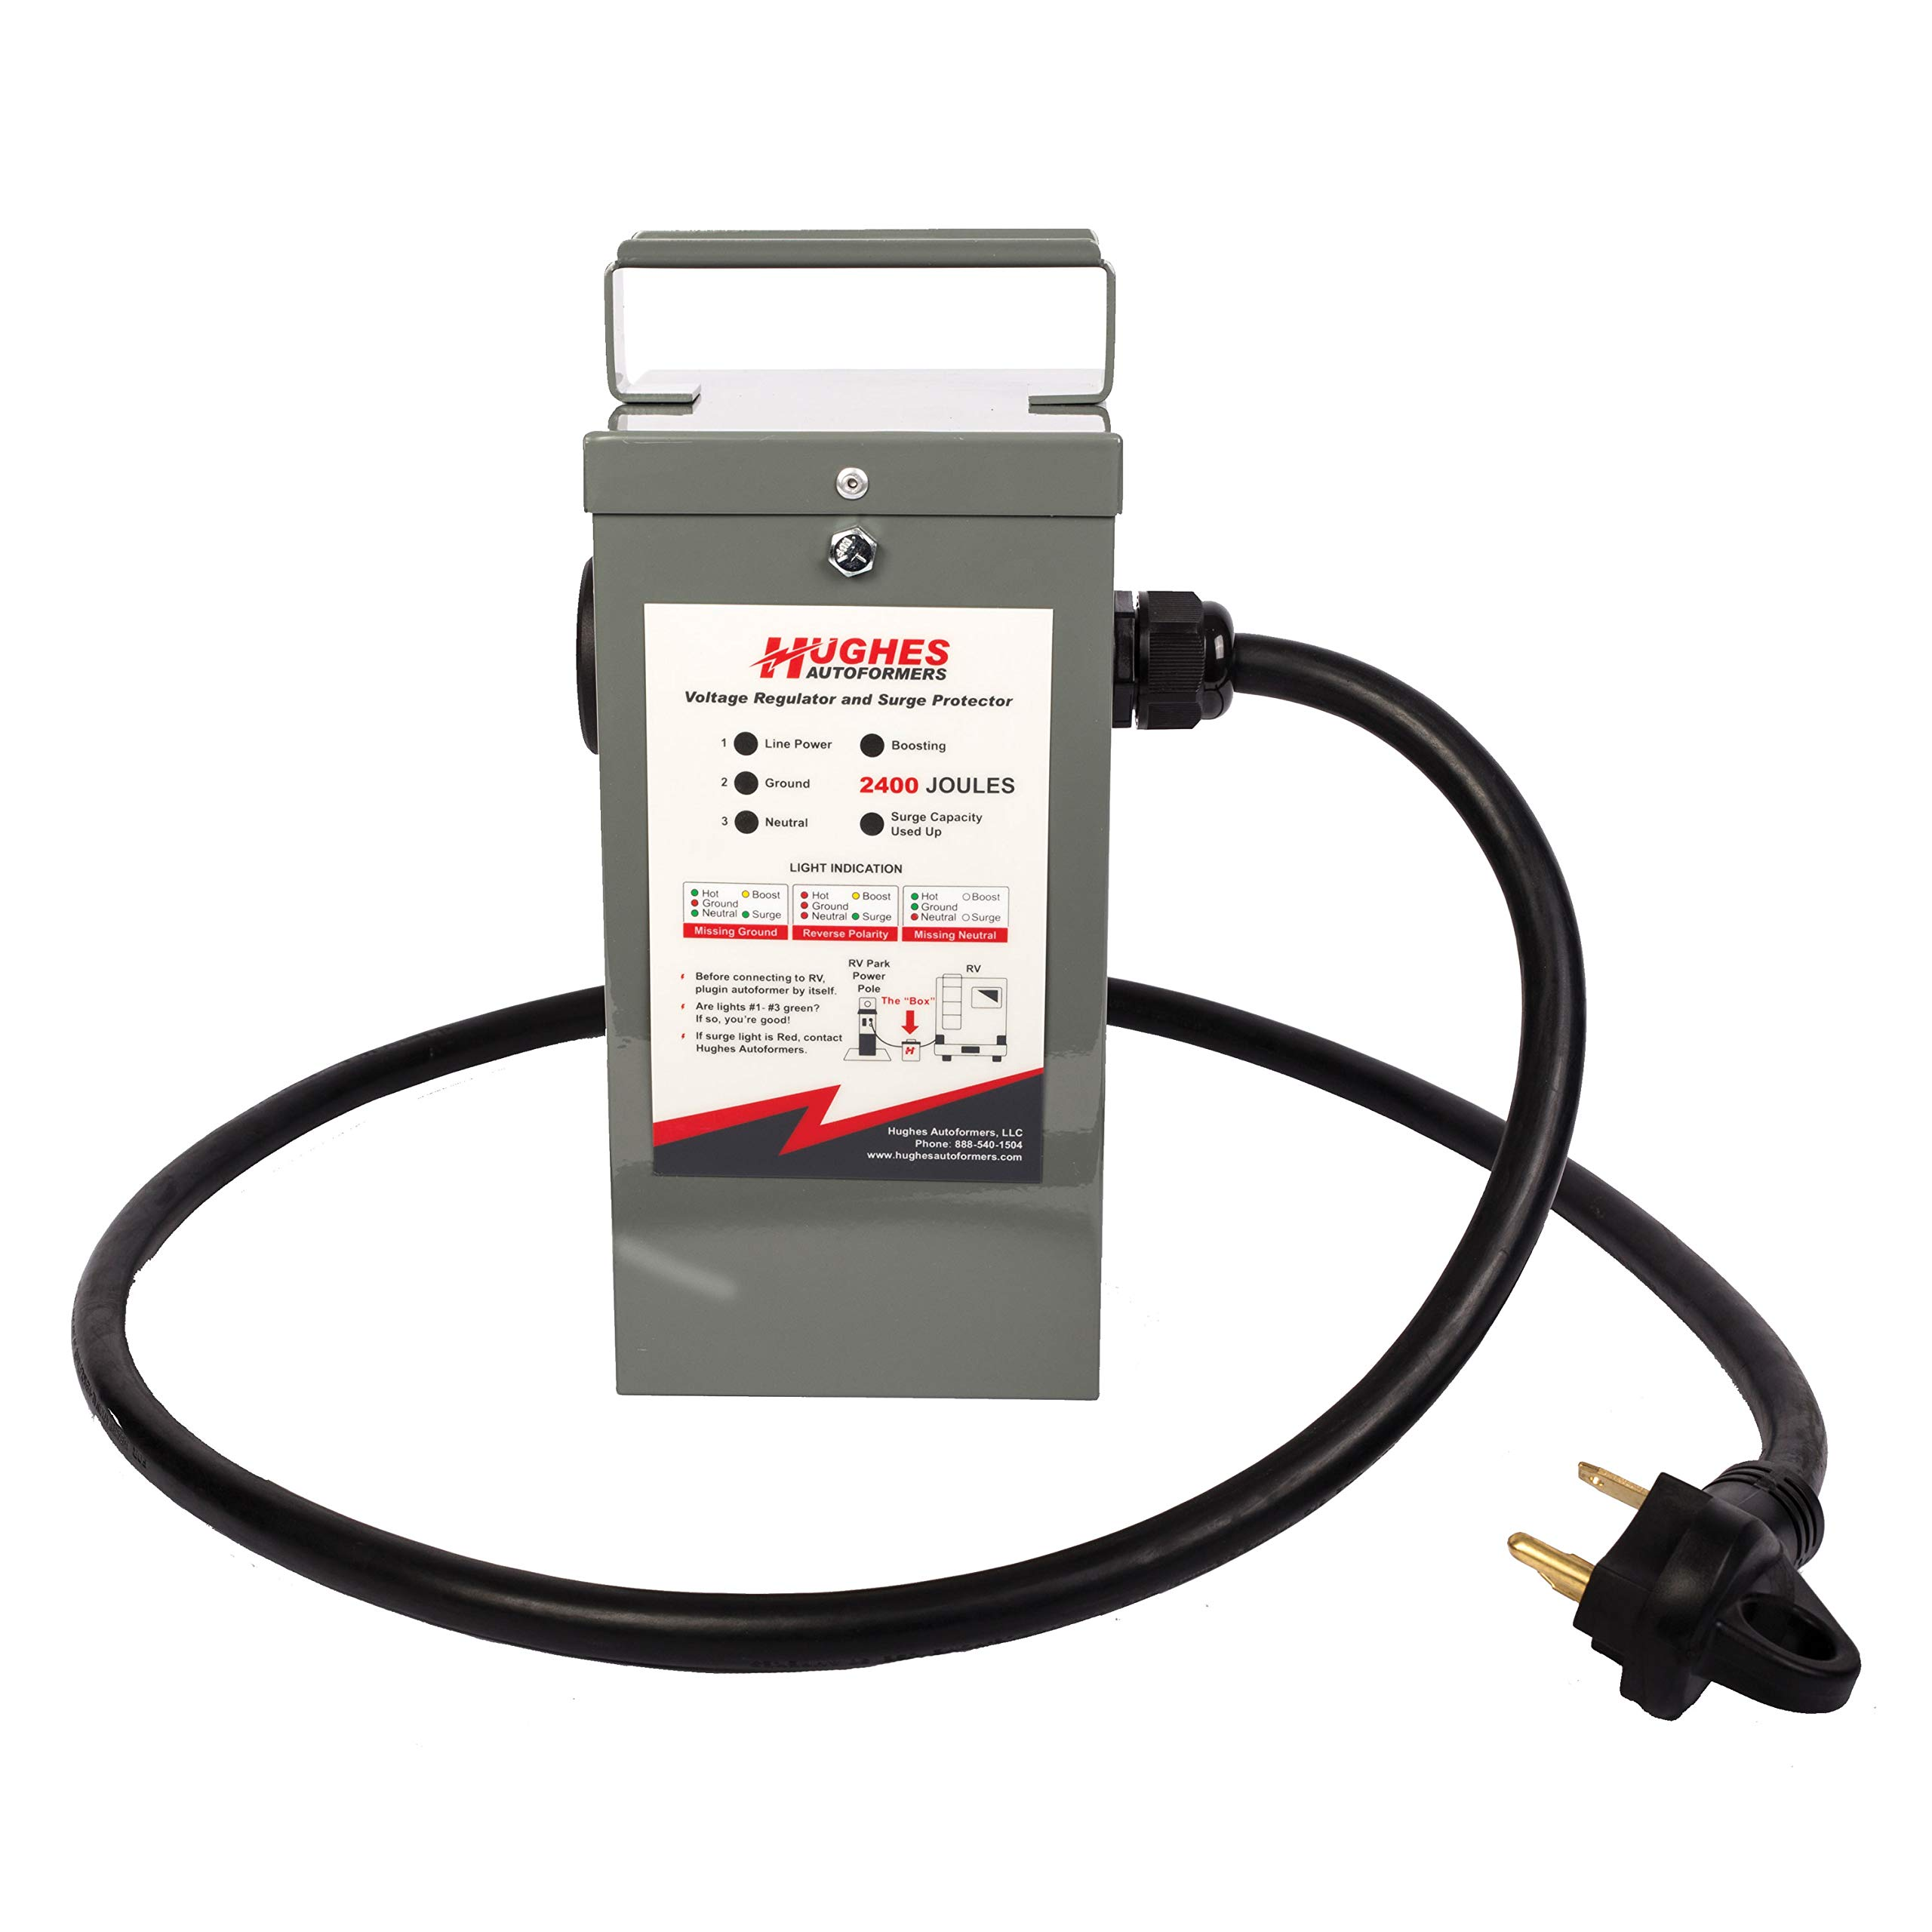 Hughes Autoformers RV2130-SP Voltage Booster/Surge 30 Amp by Hughes Autoformers